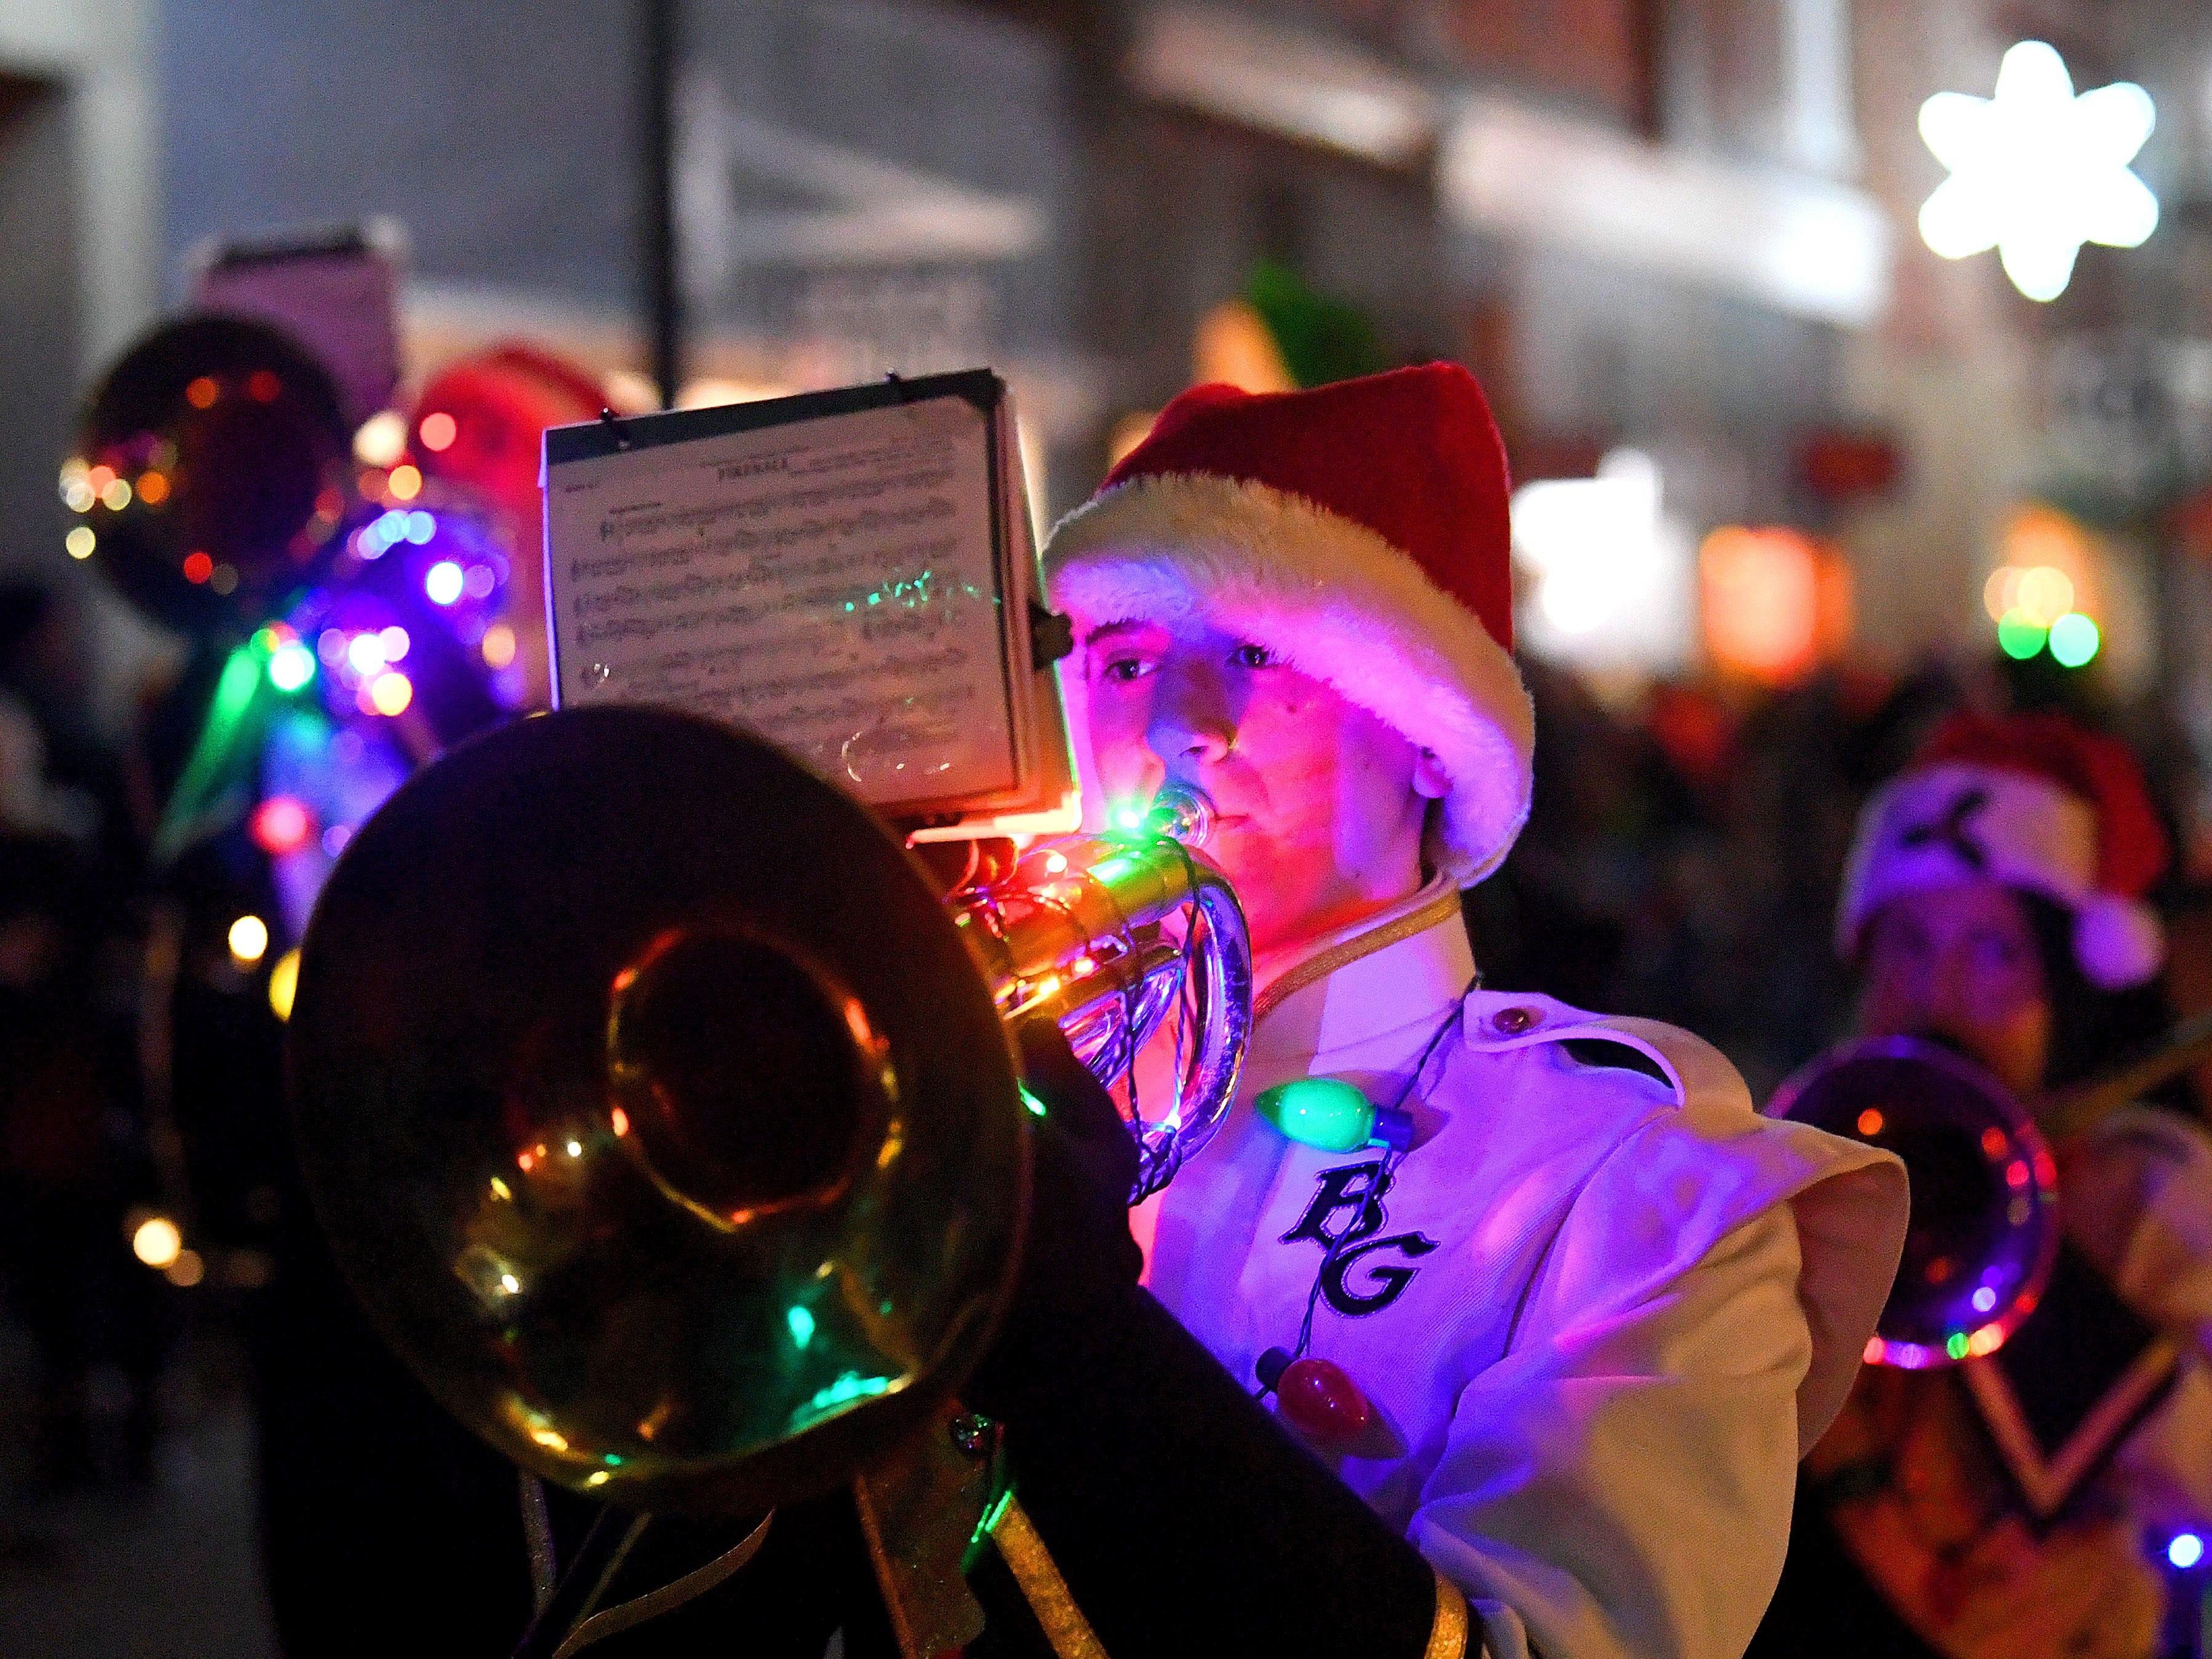 The Buffalo Gap High School marching band performs during the Staunton Christmas Parade on Monday, Nov. 26, 2018.